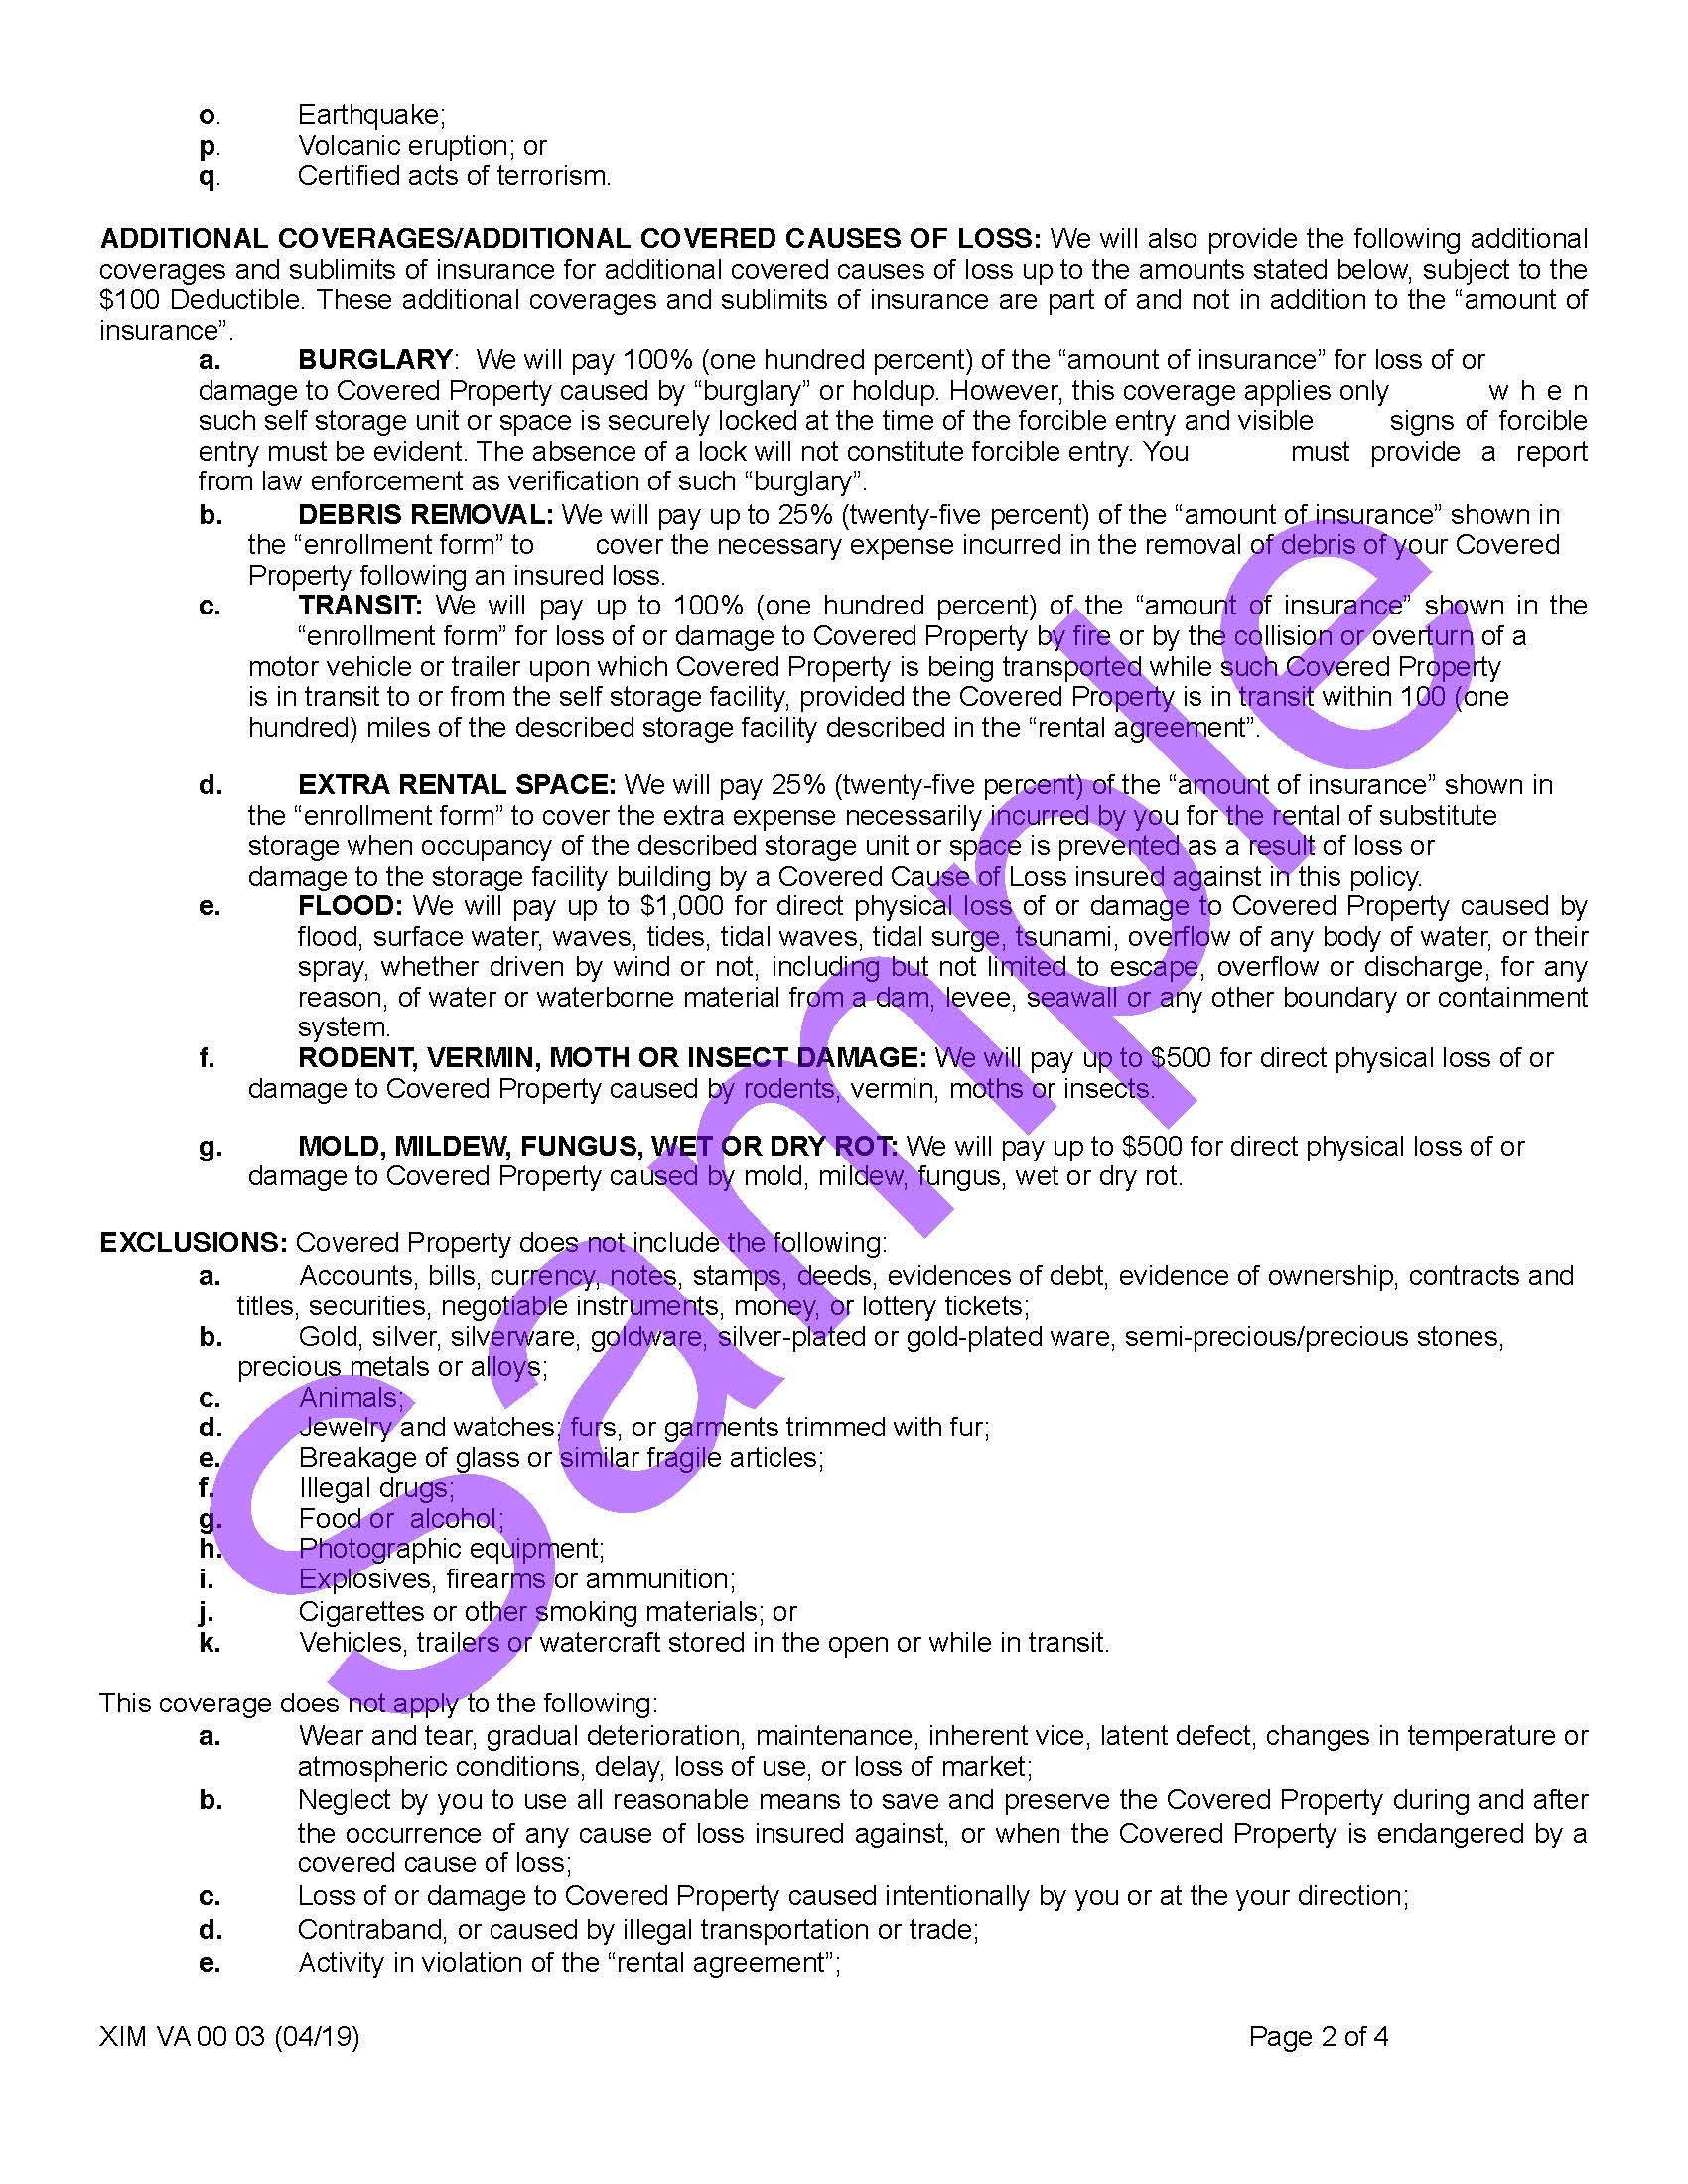 XIM VA 00 03 04 19 Virginia Certificate of InsuranceSample_Page_2.jpg